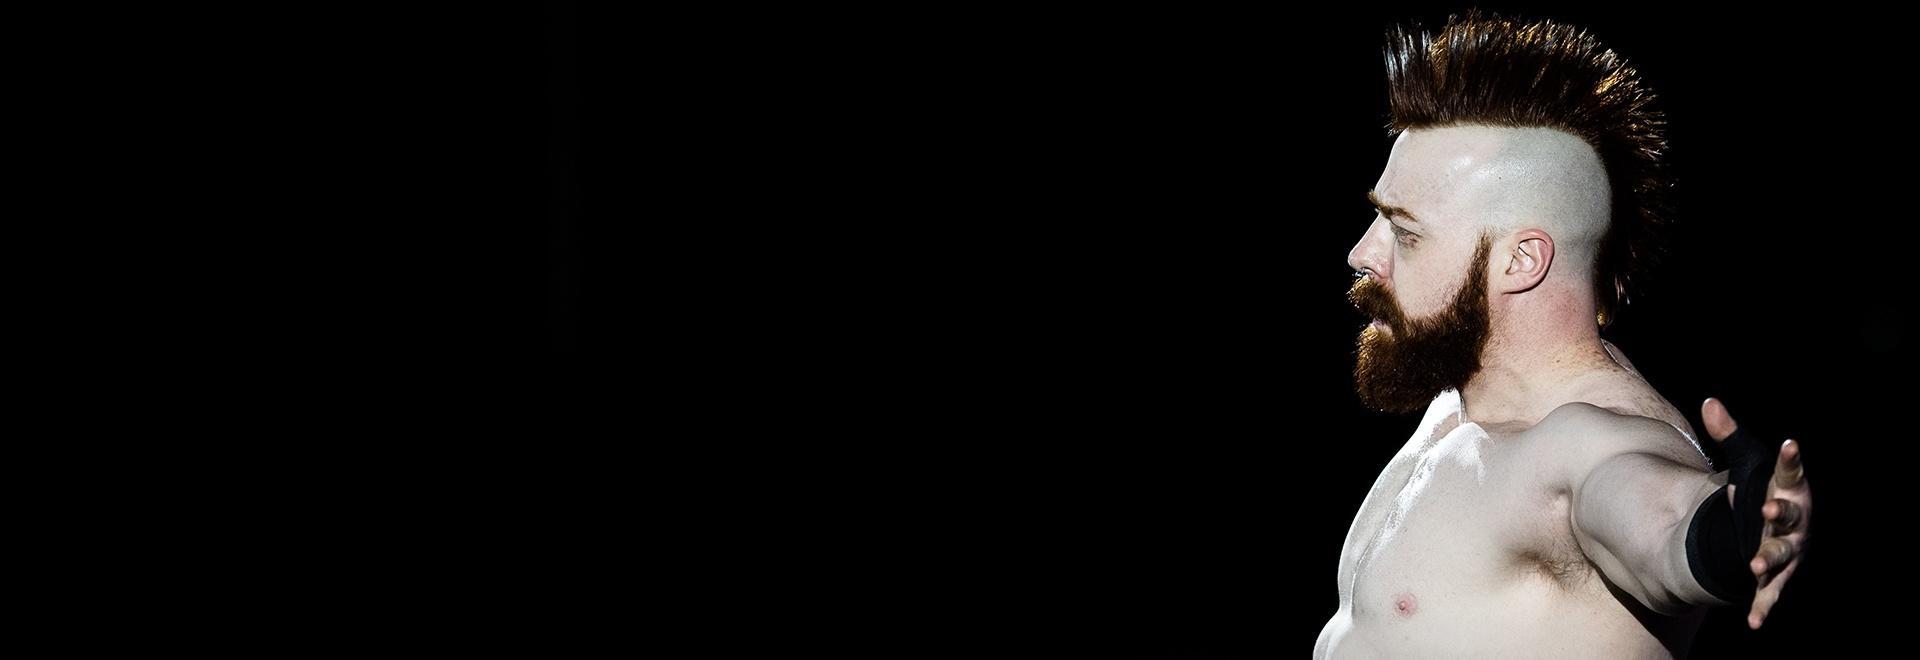 Ep. 228